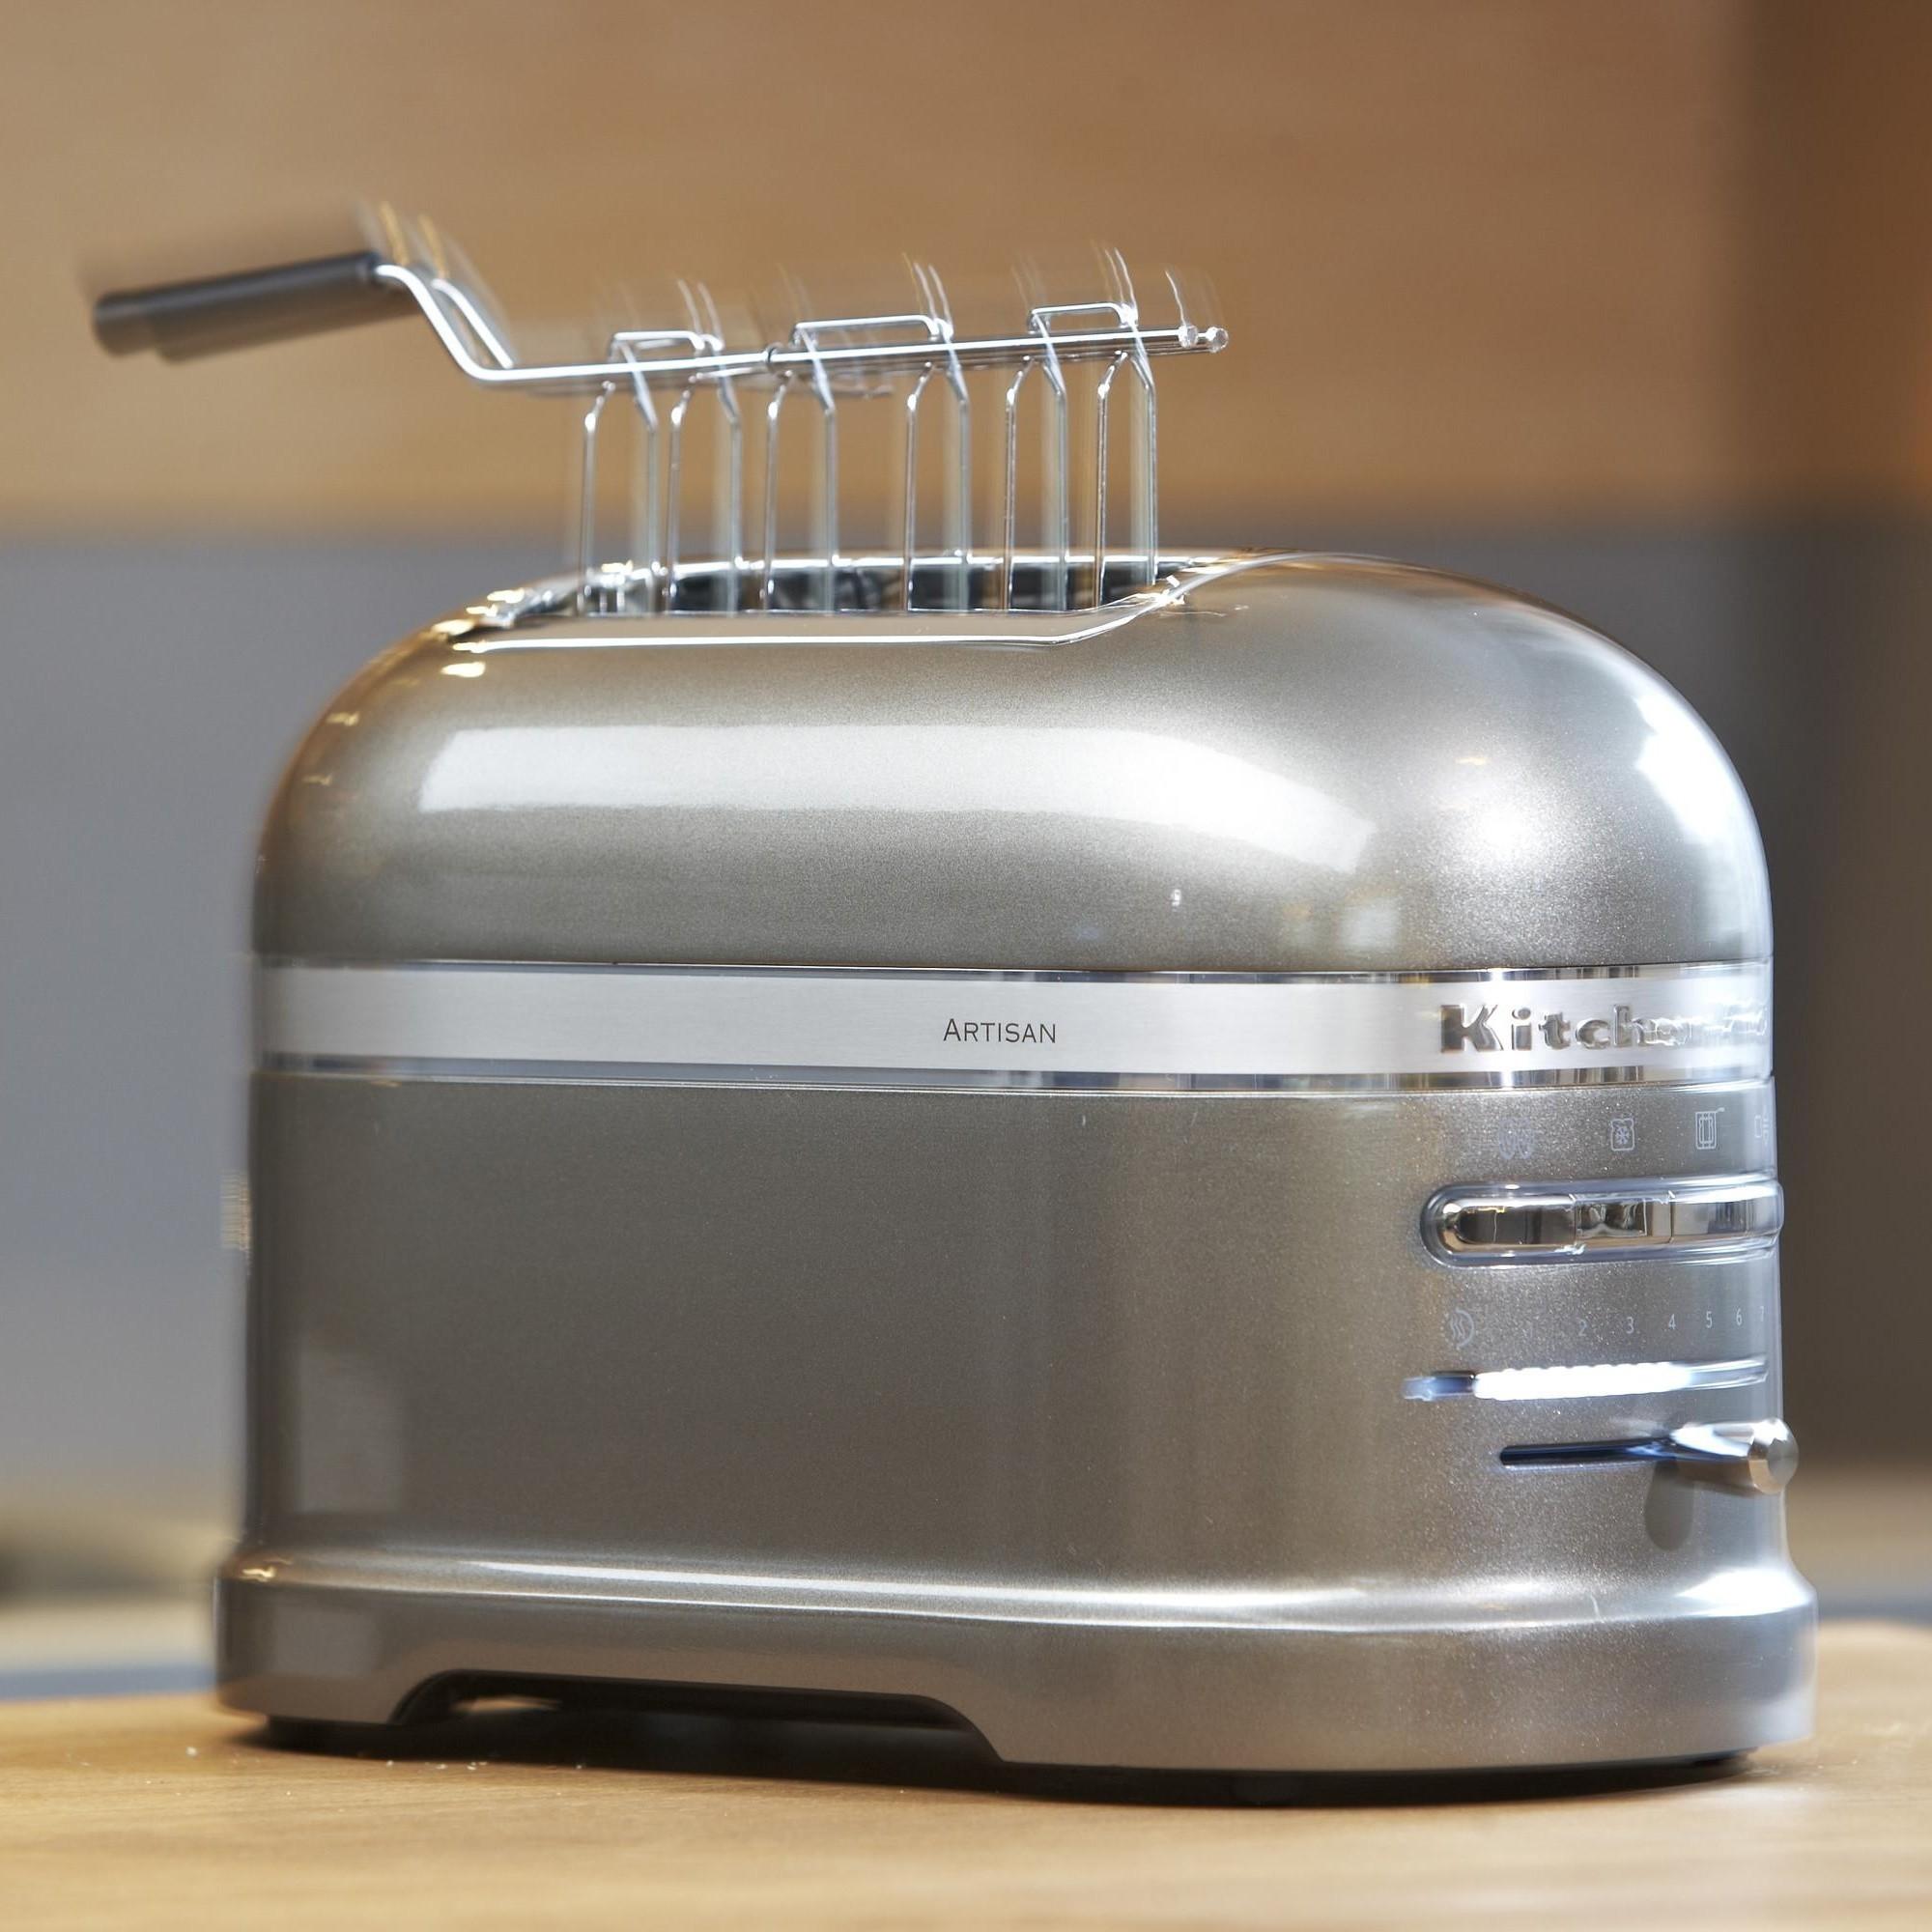 KitchenAid Artisan 5KMT2204 Toaster 2 Scheiben